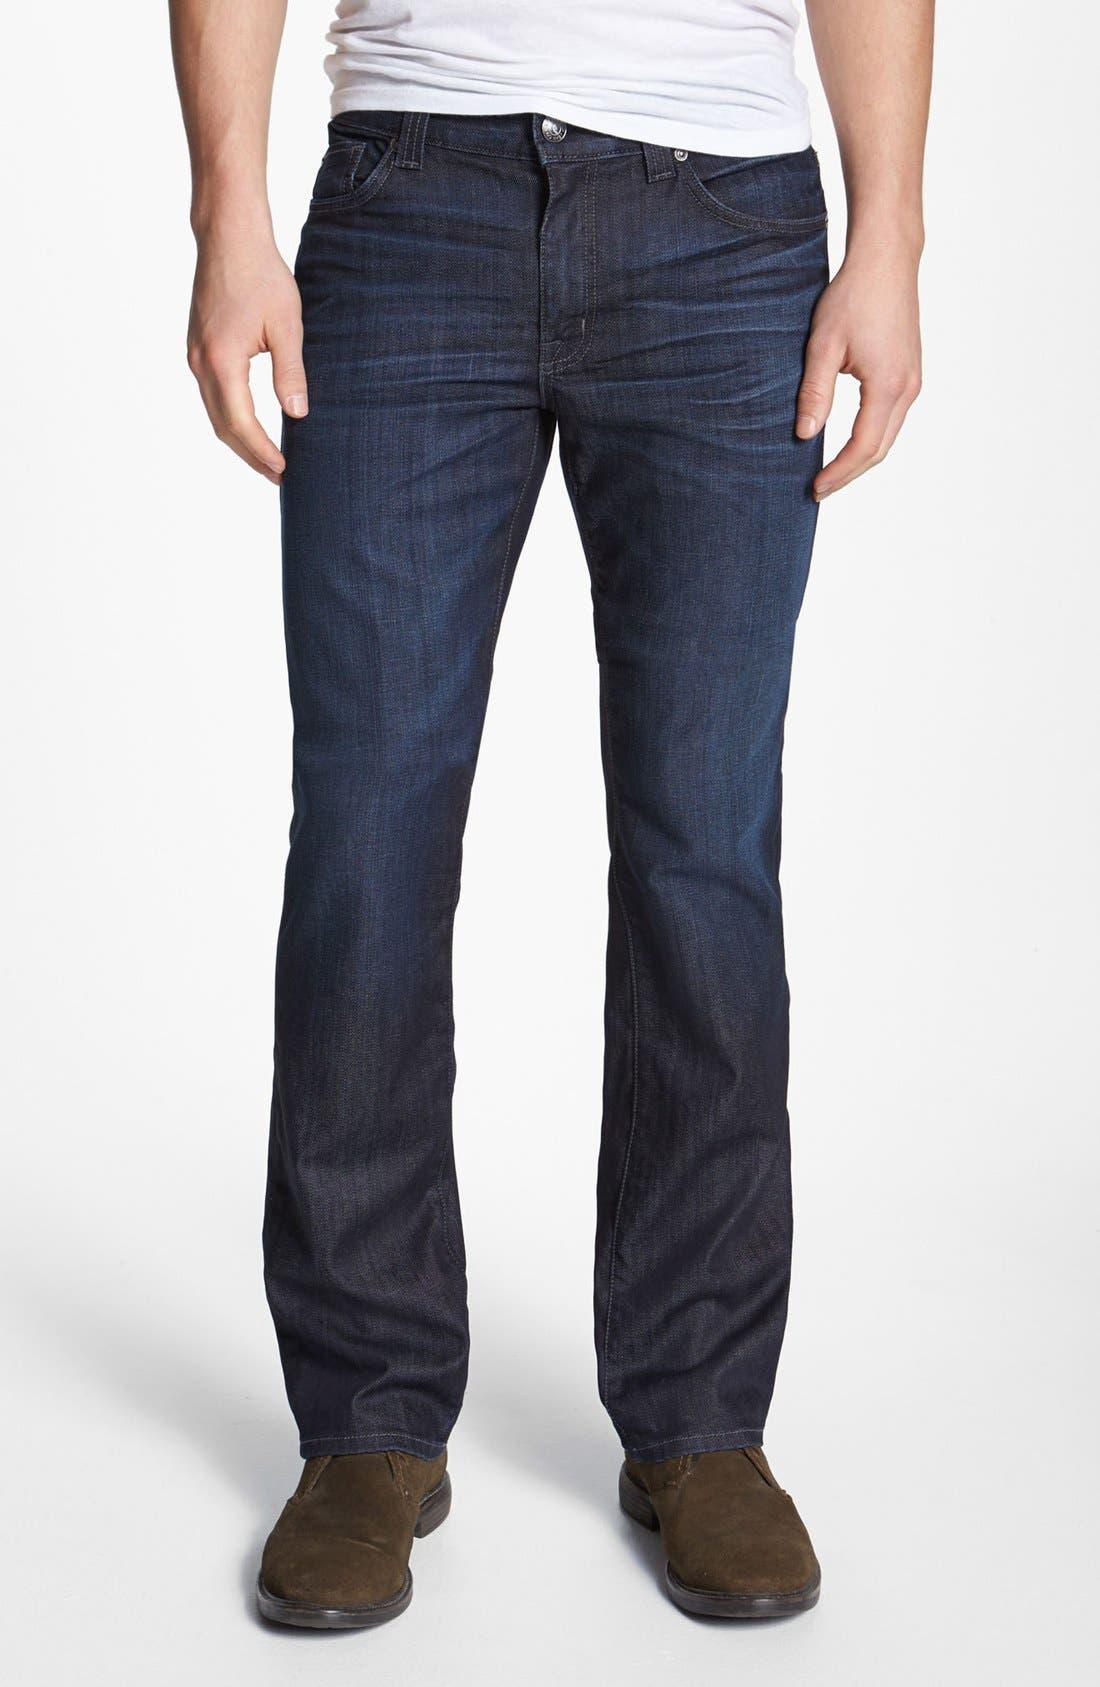 Main Image - Fidelity Denim 'Impala' Straight Leg Jeans (Lennon Dark Wash)